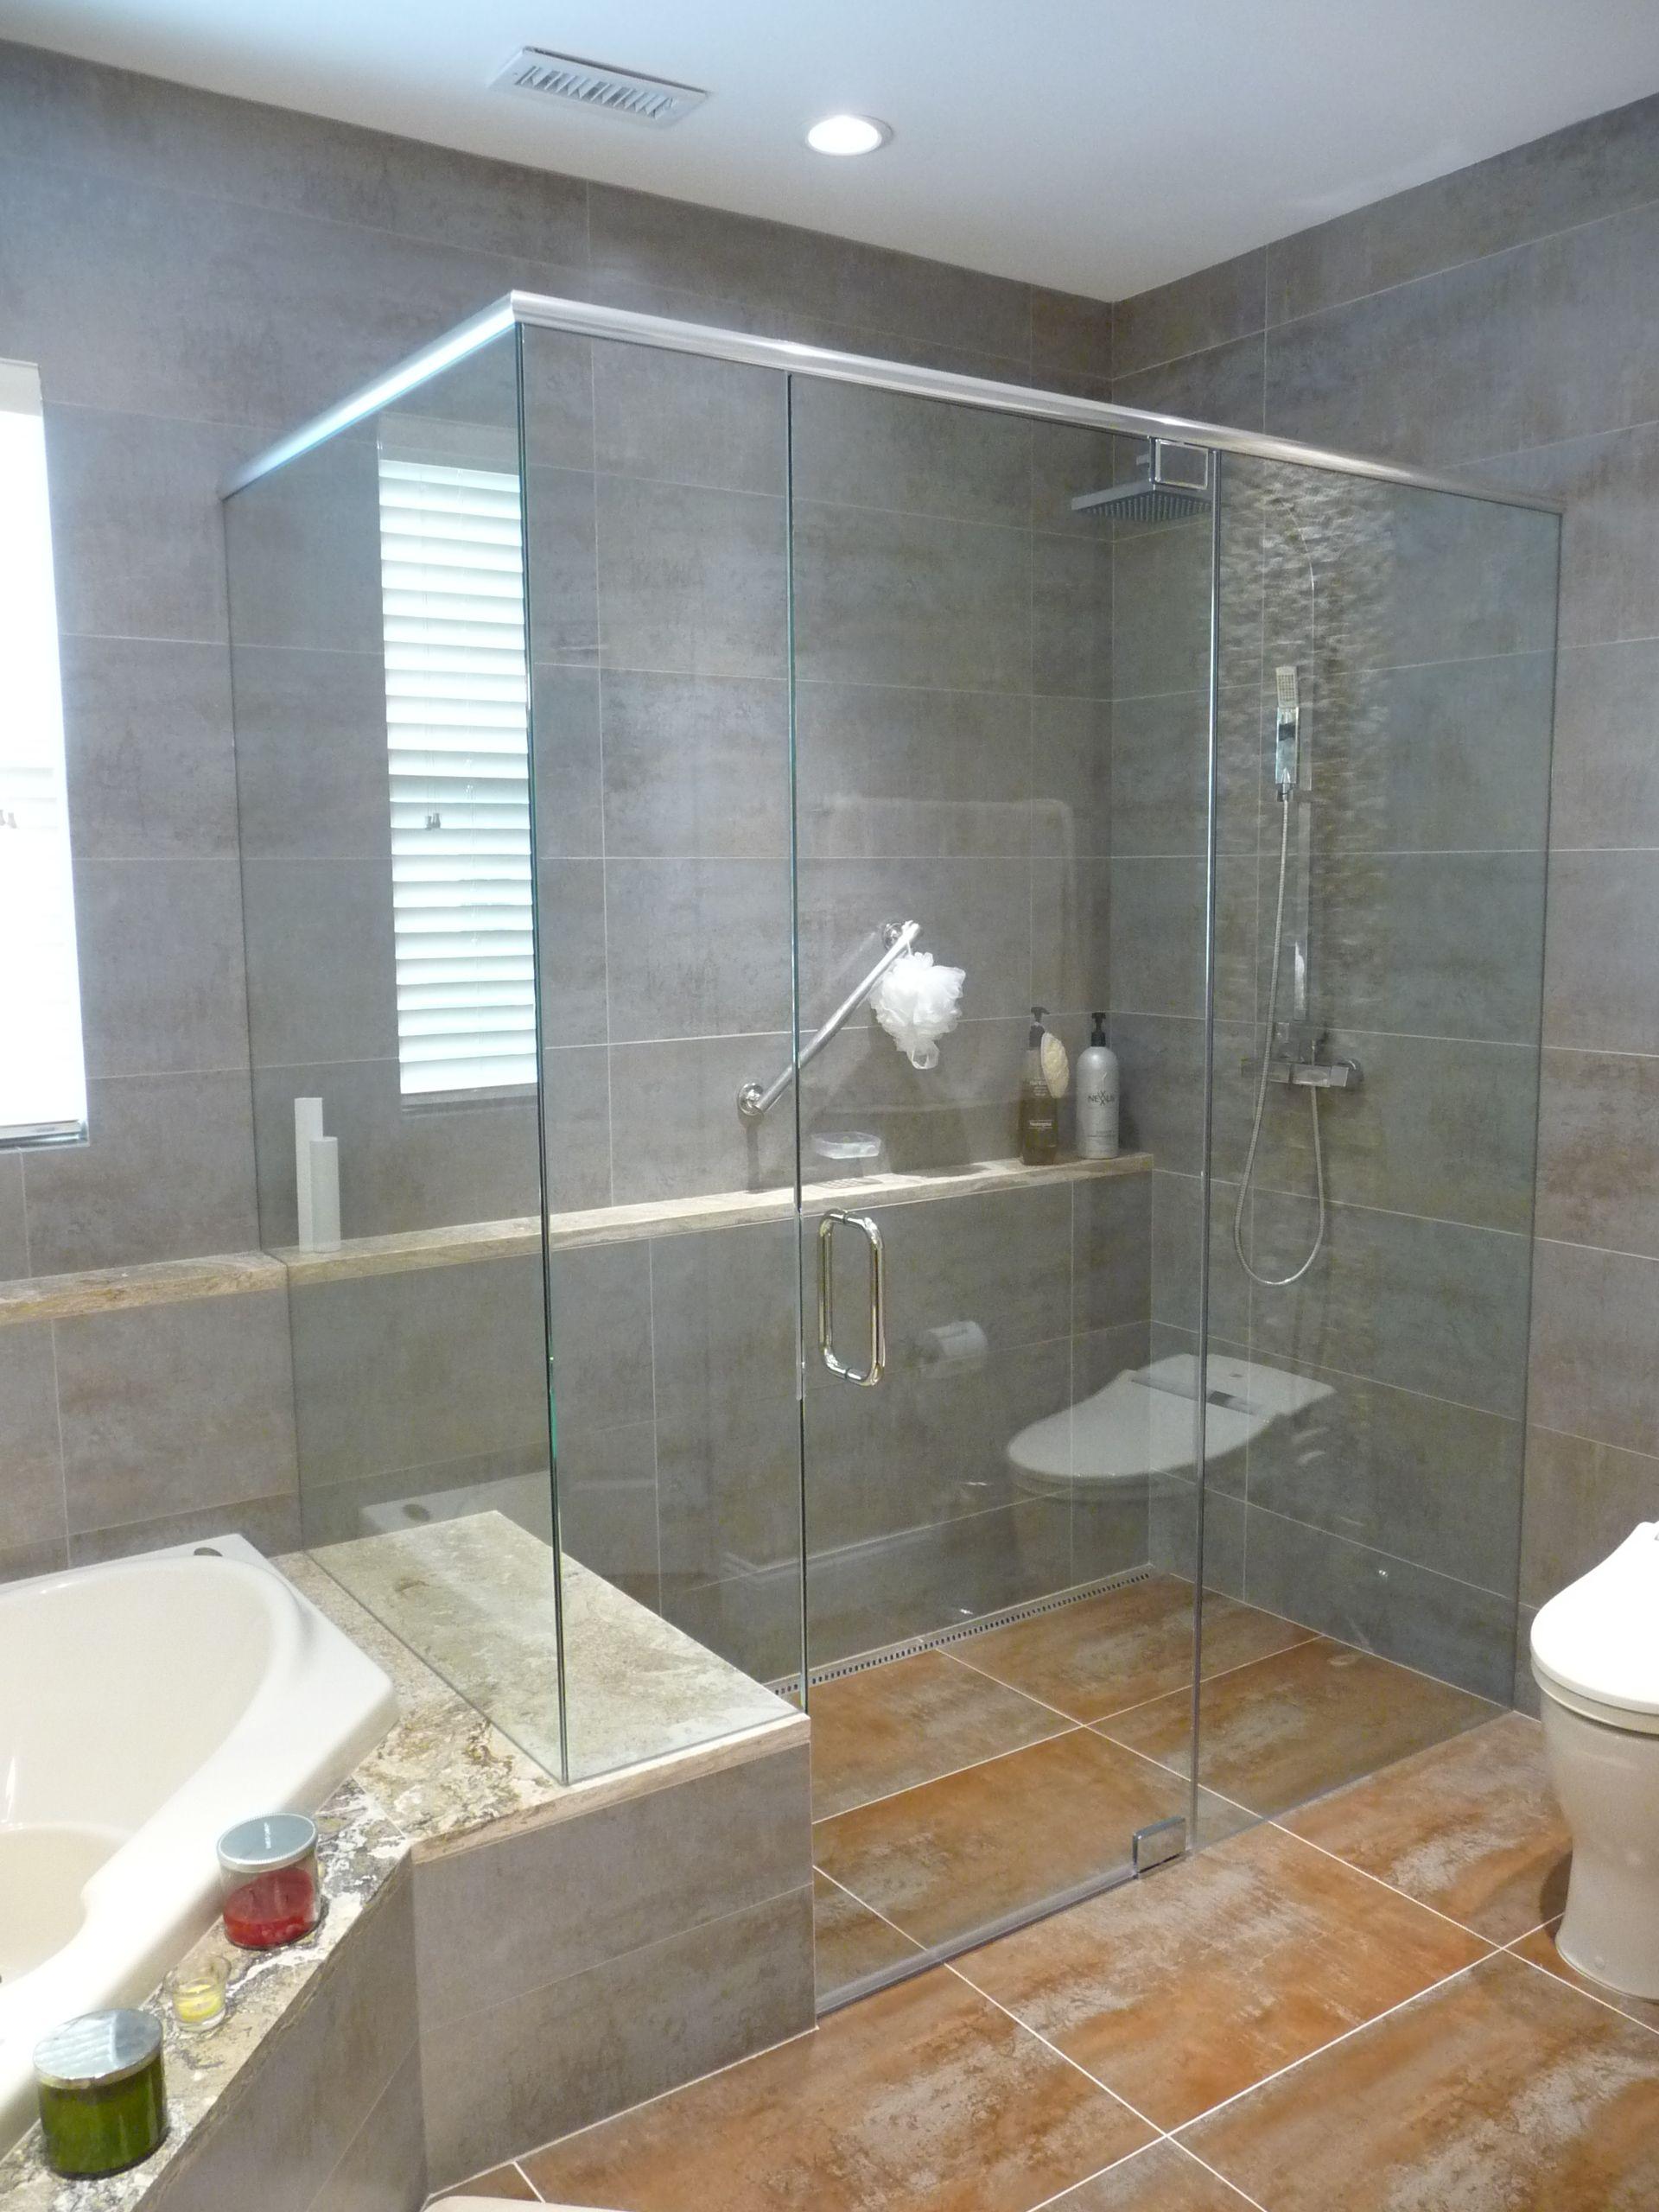 Venis Ruggine Aluminio Walls Ferroker Caldera Floors